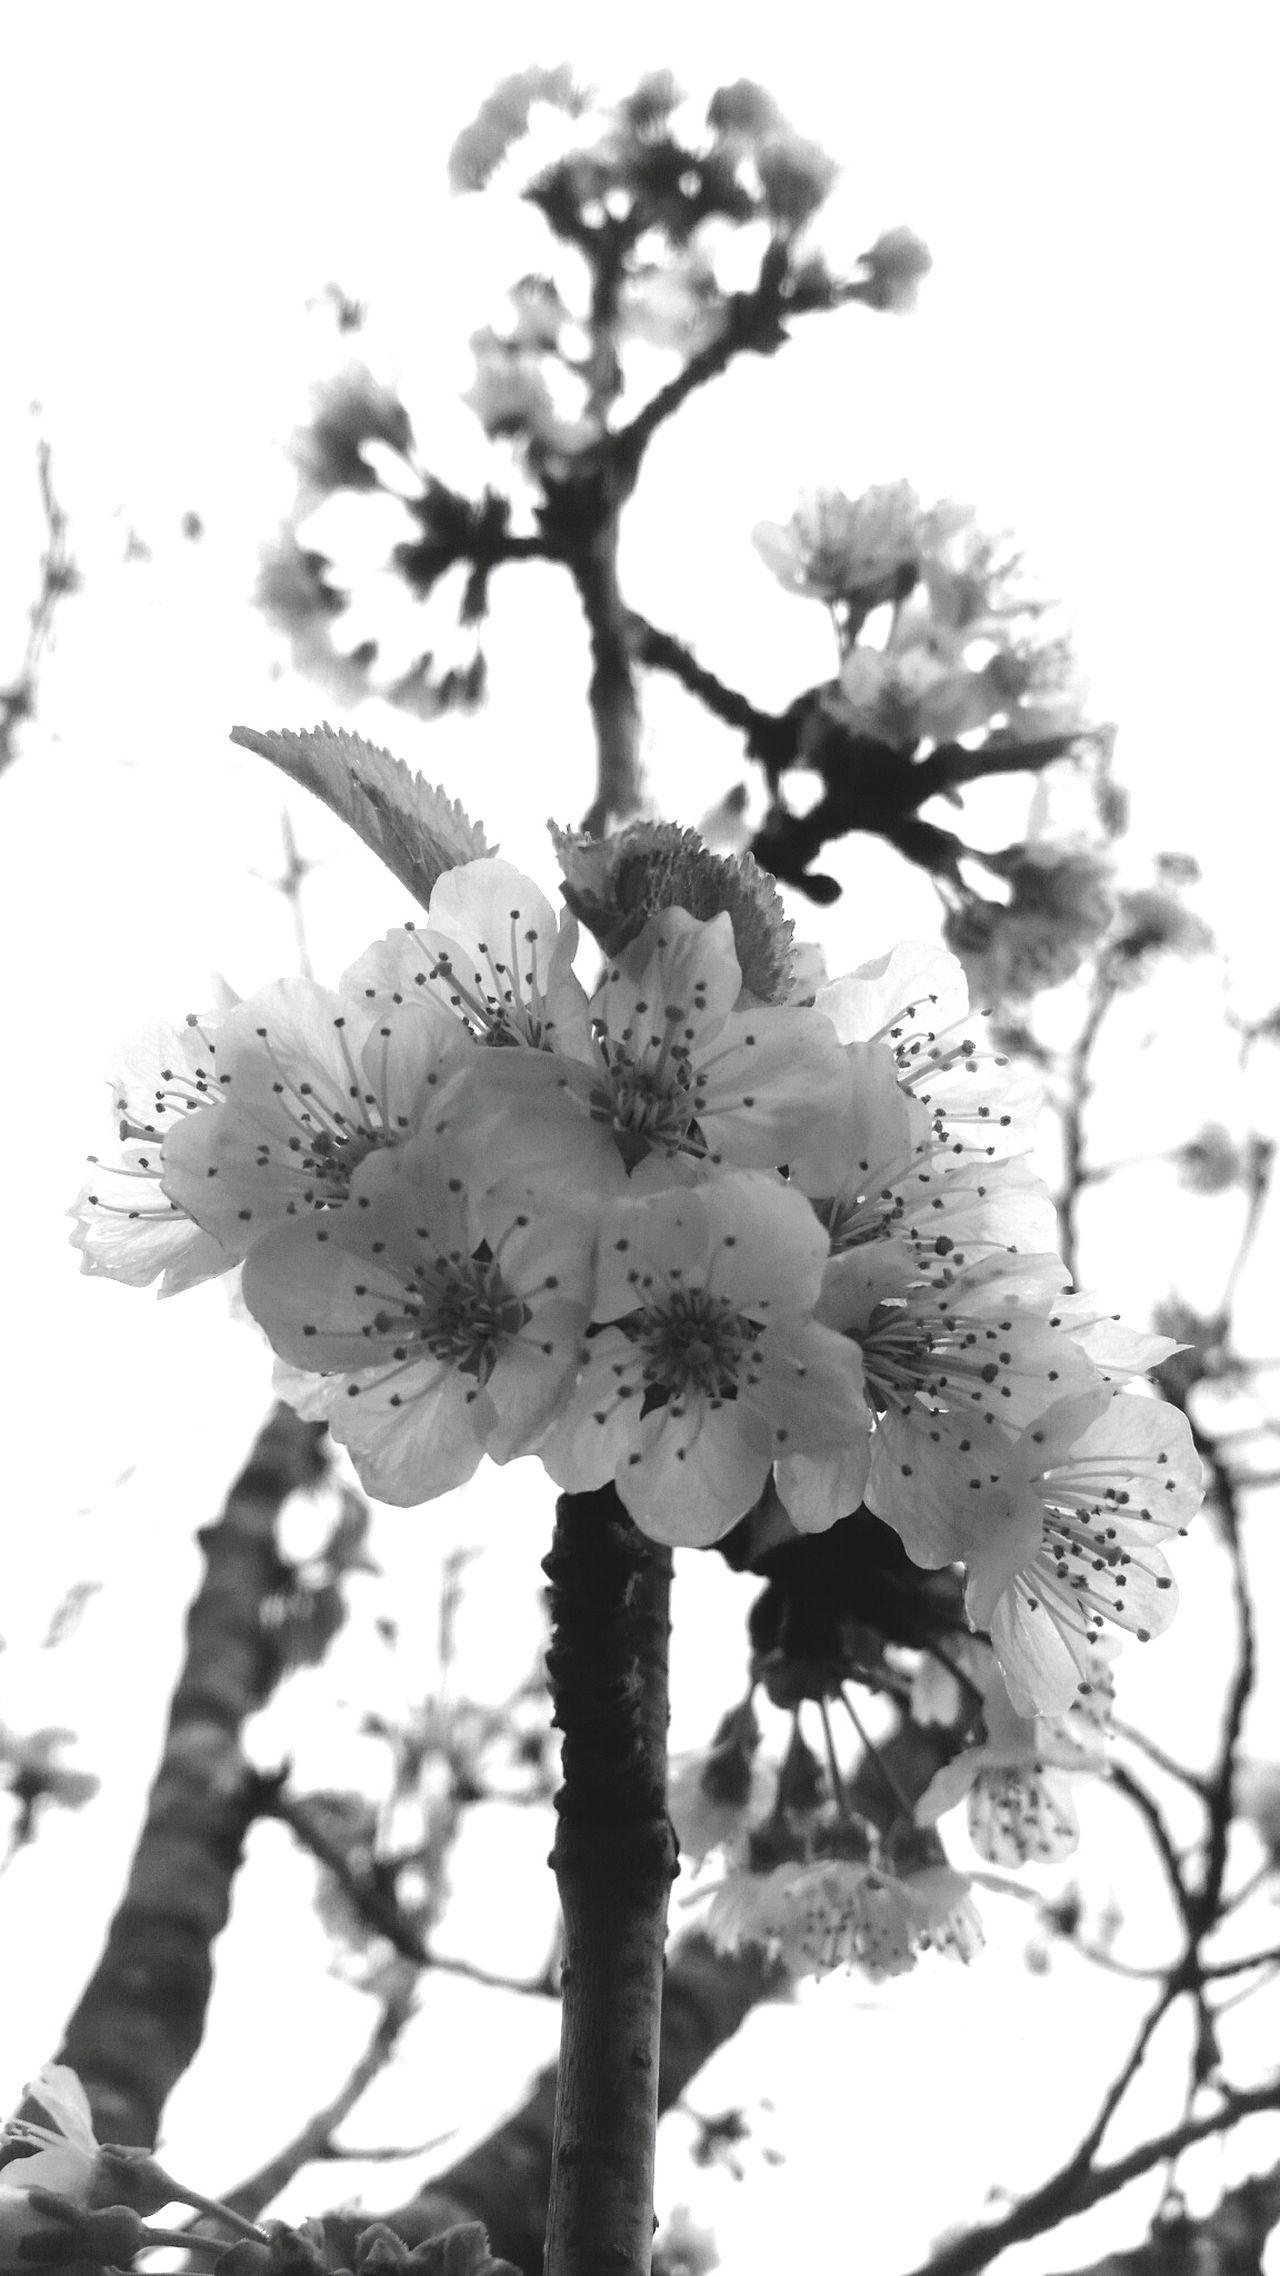 Flower Collection Flowerporn Flowers Blackandwhite Blackandwhite Photography Bohemian Natural Beauty Flower Photography Beautiful Nature Beautiful